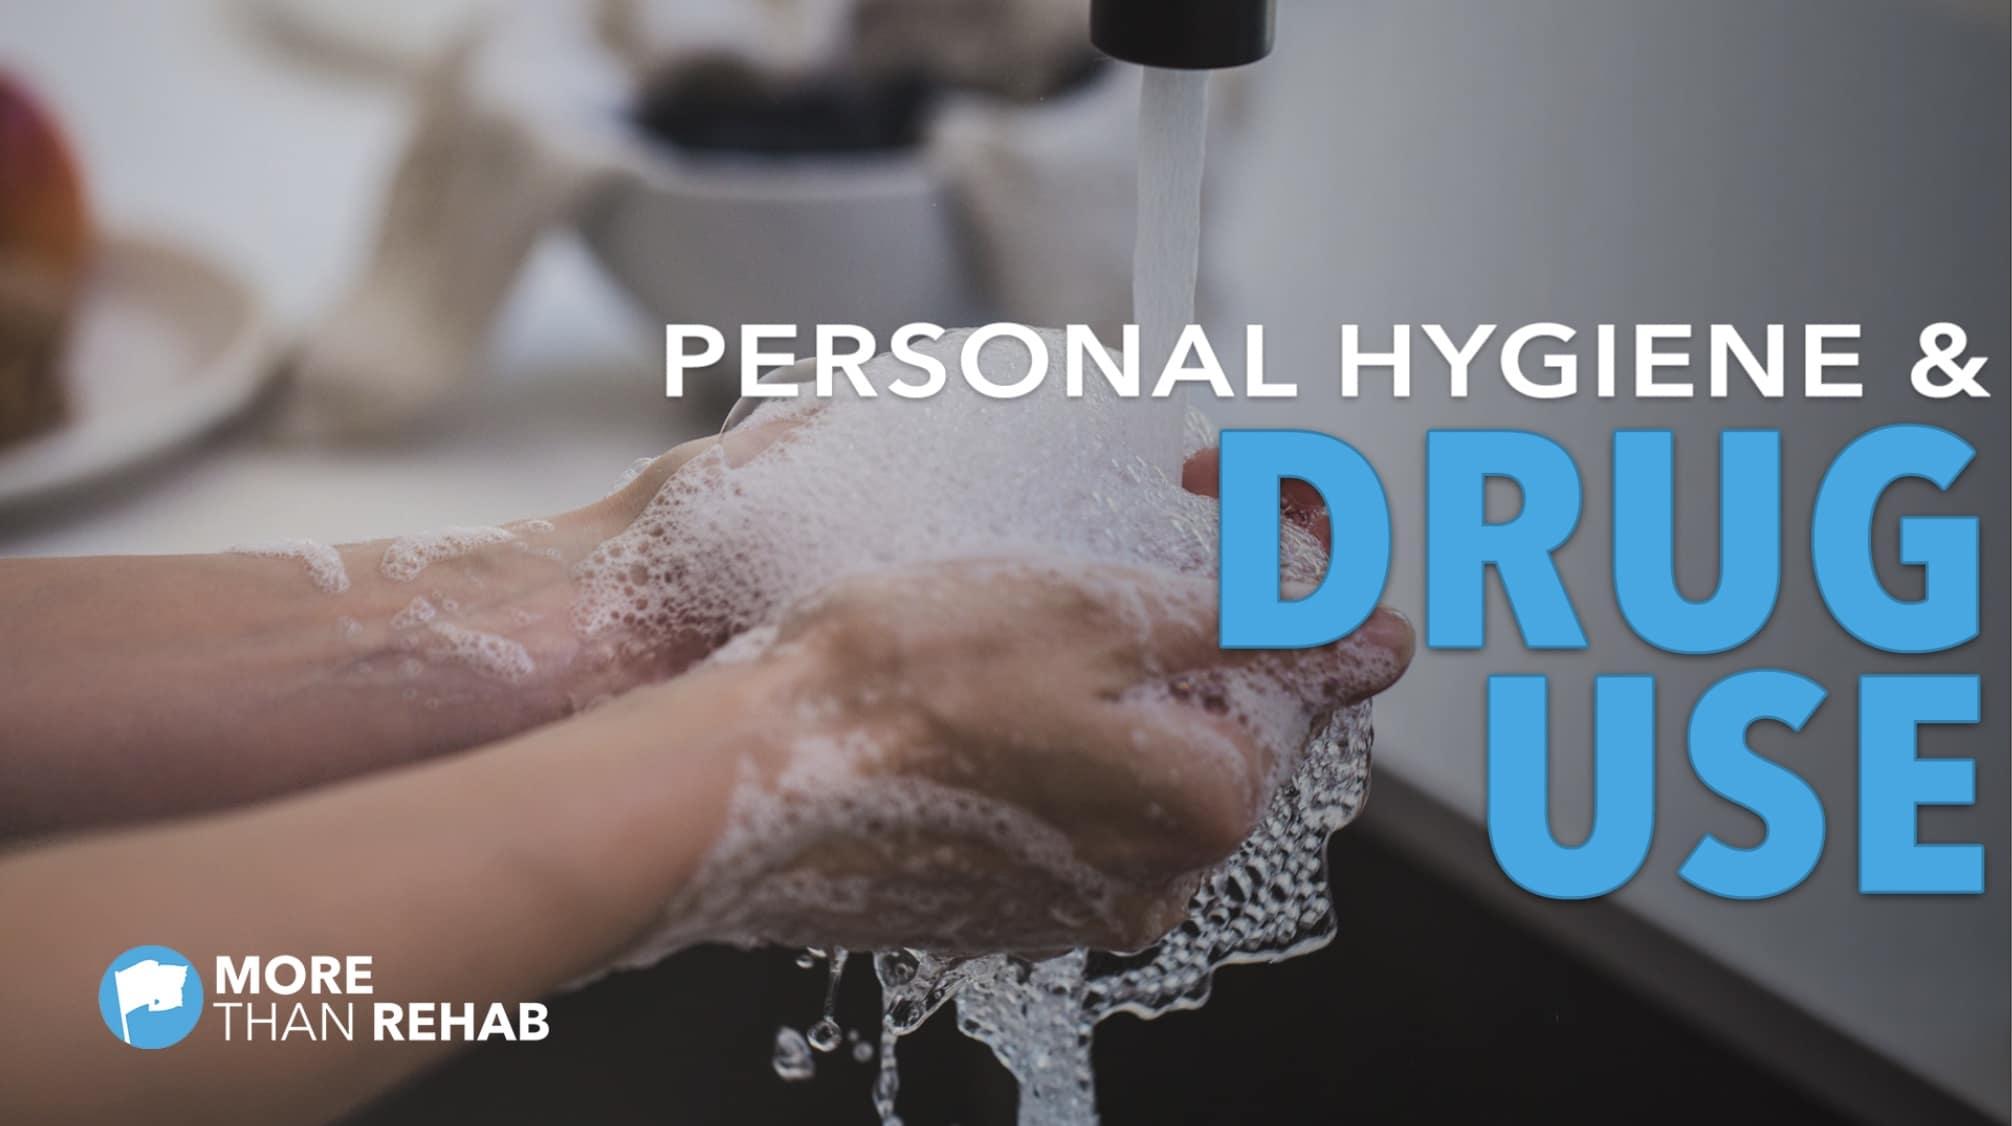 hygiene-drug-use-cause-lack-of-self-care-hair-teeth-health-addiction